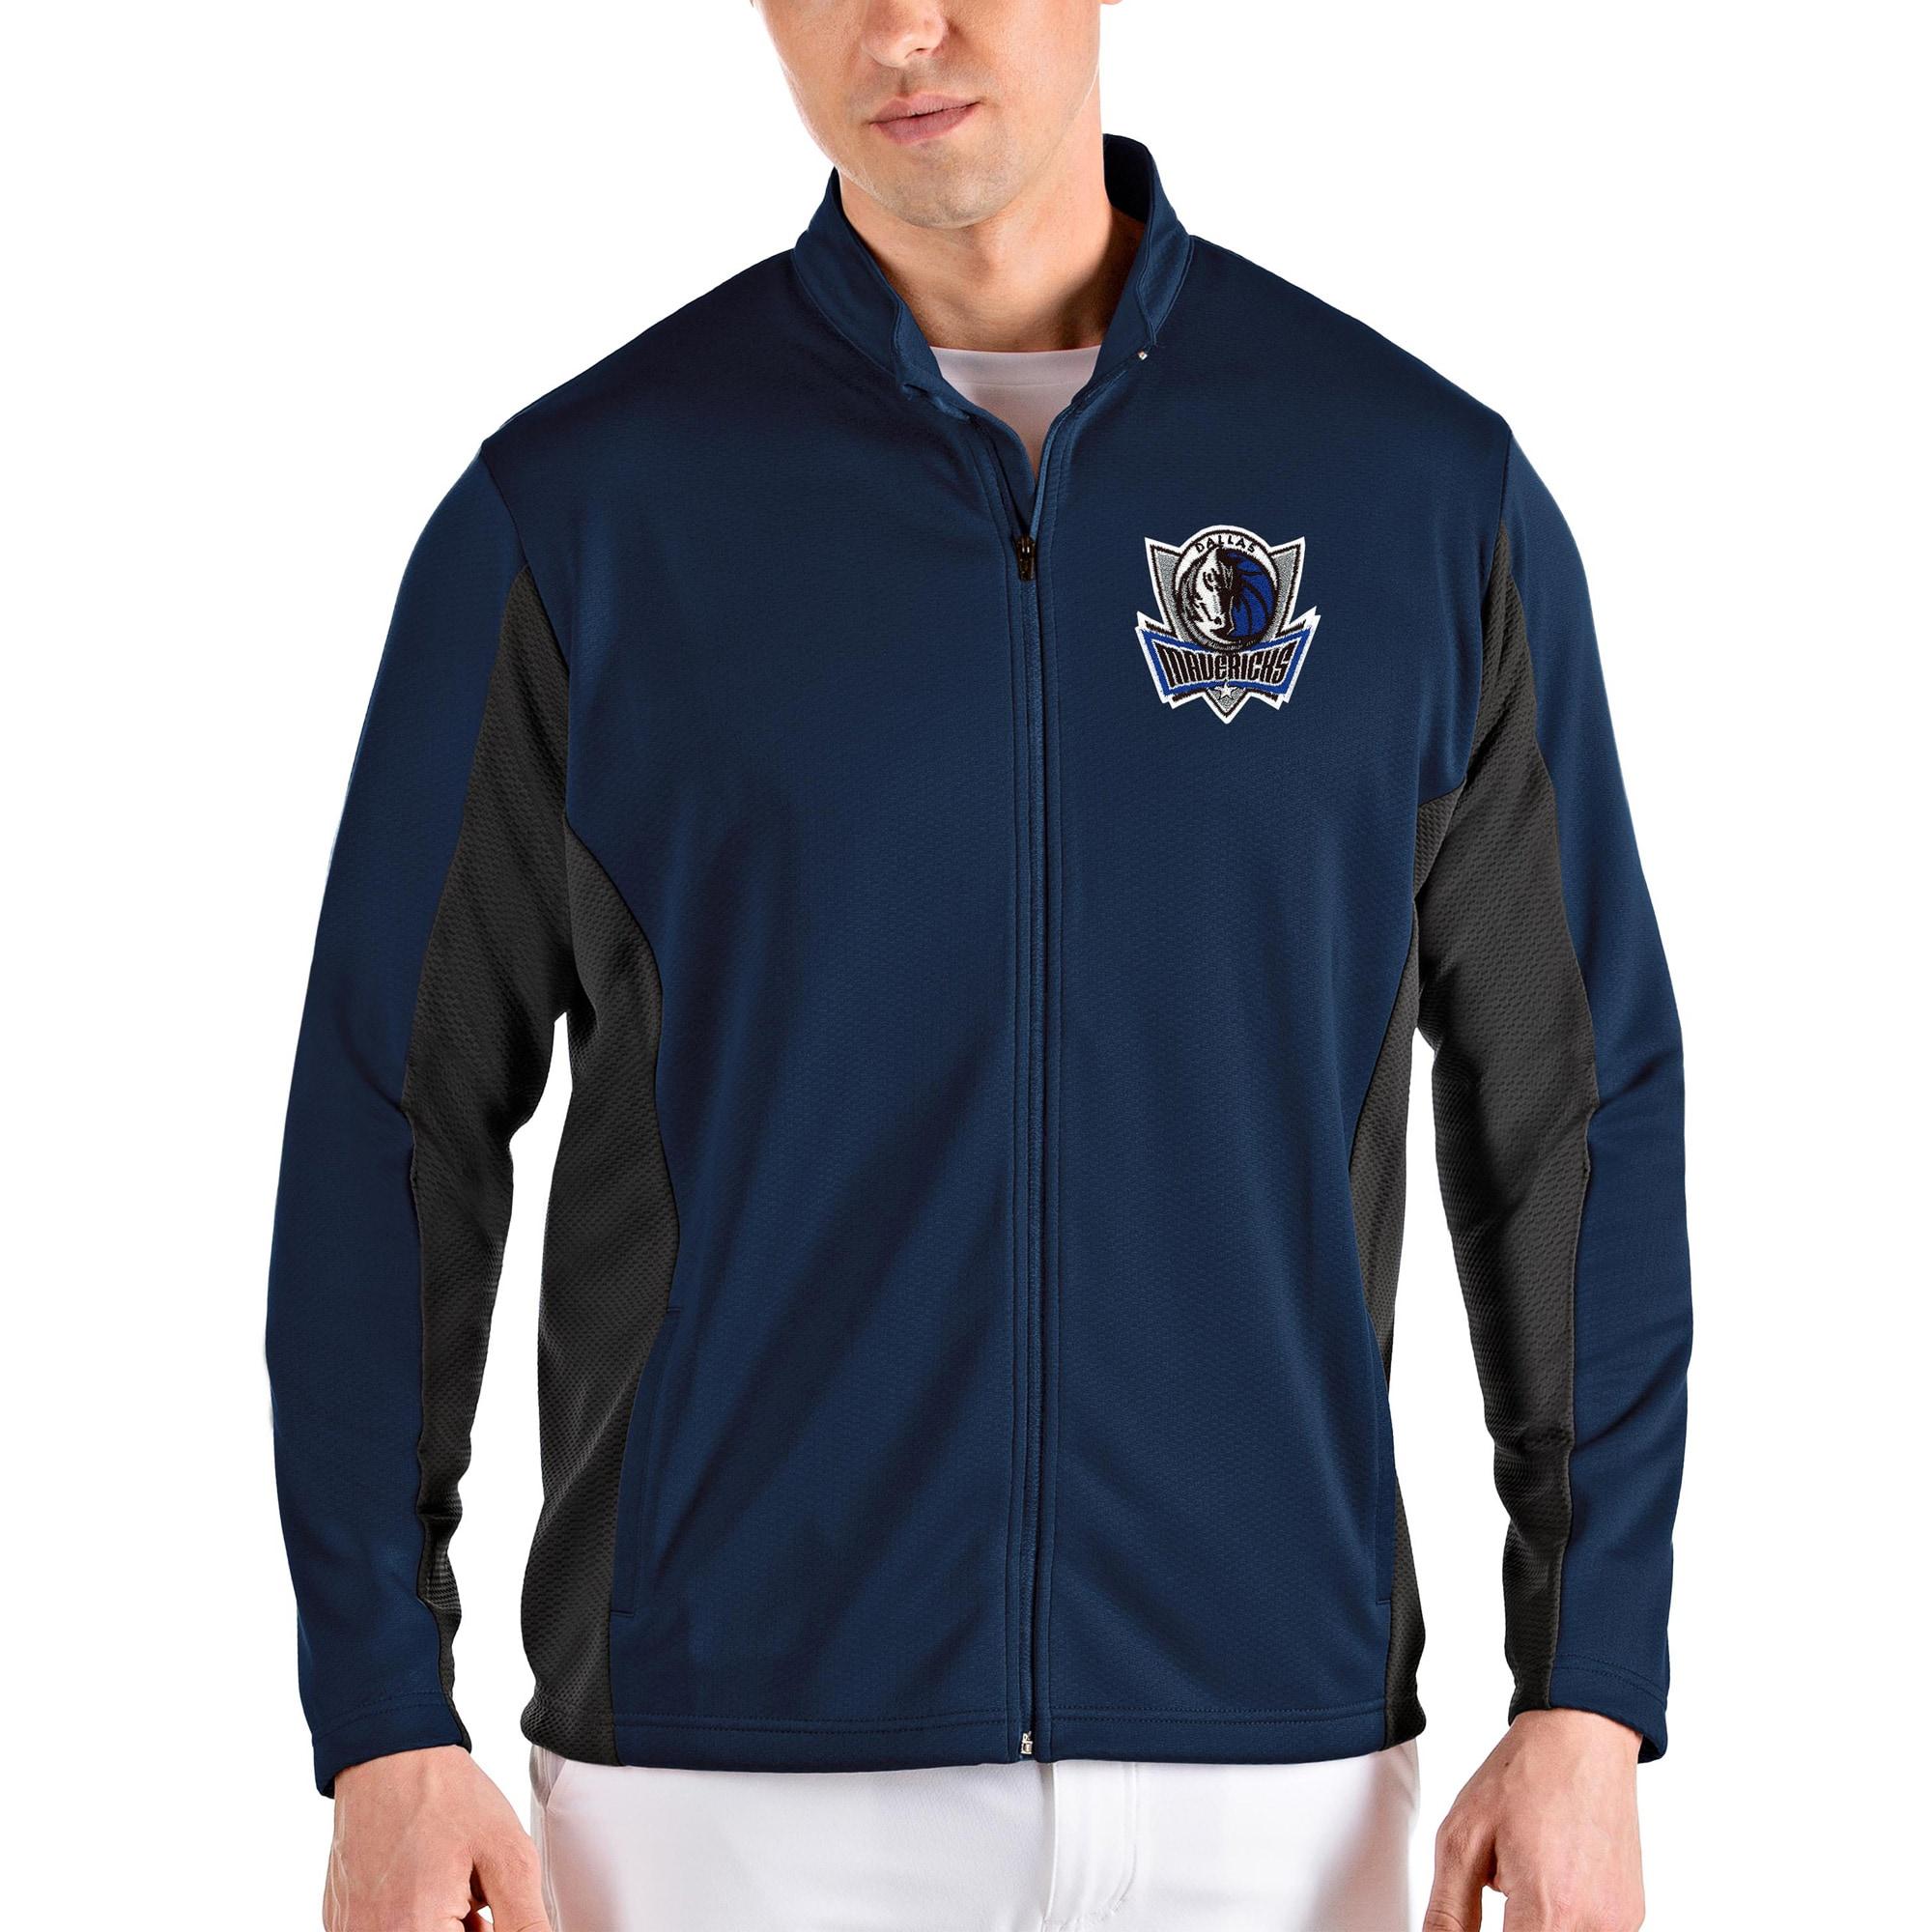 Dallas Mavericks Antigua Passage Full-Zip Jacket - Navy/Gray